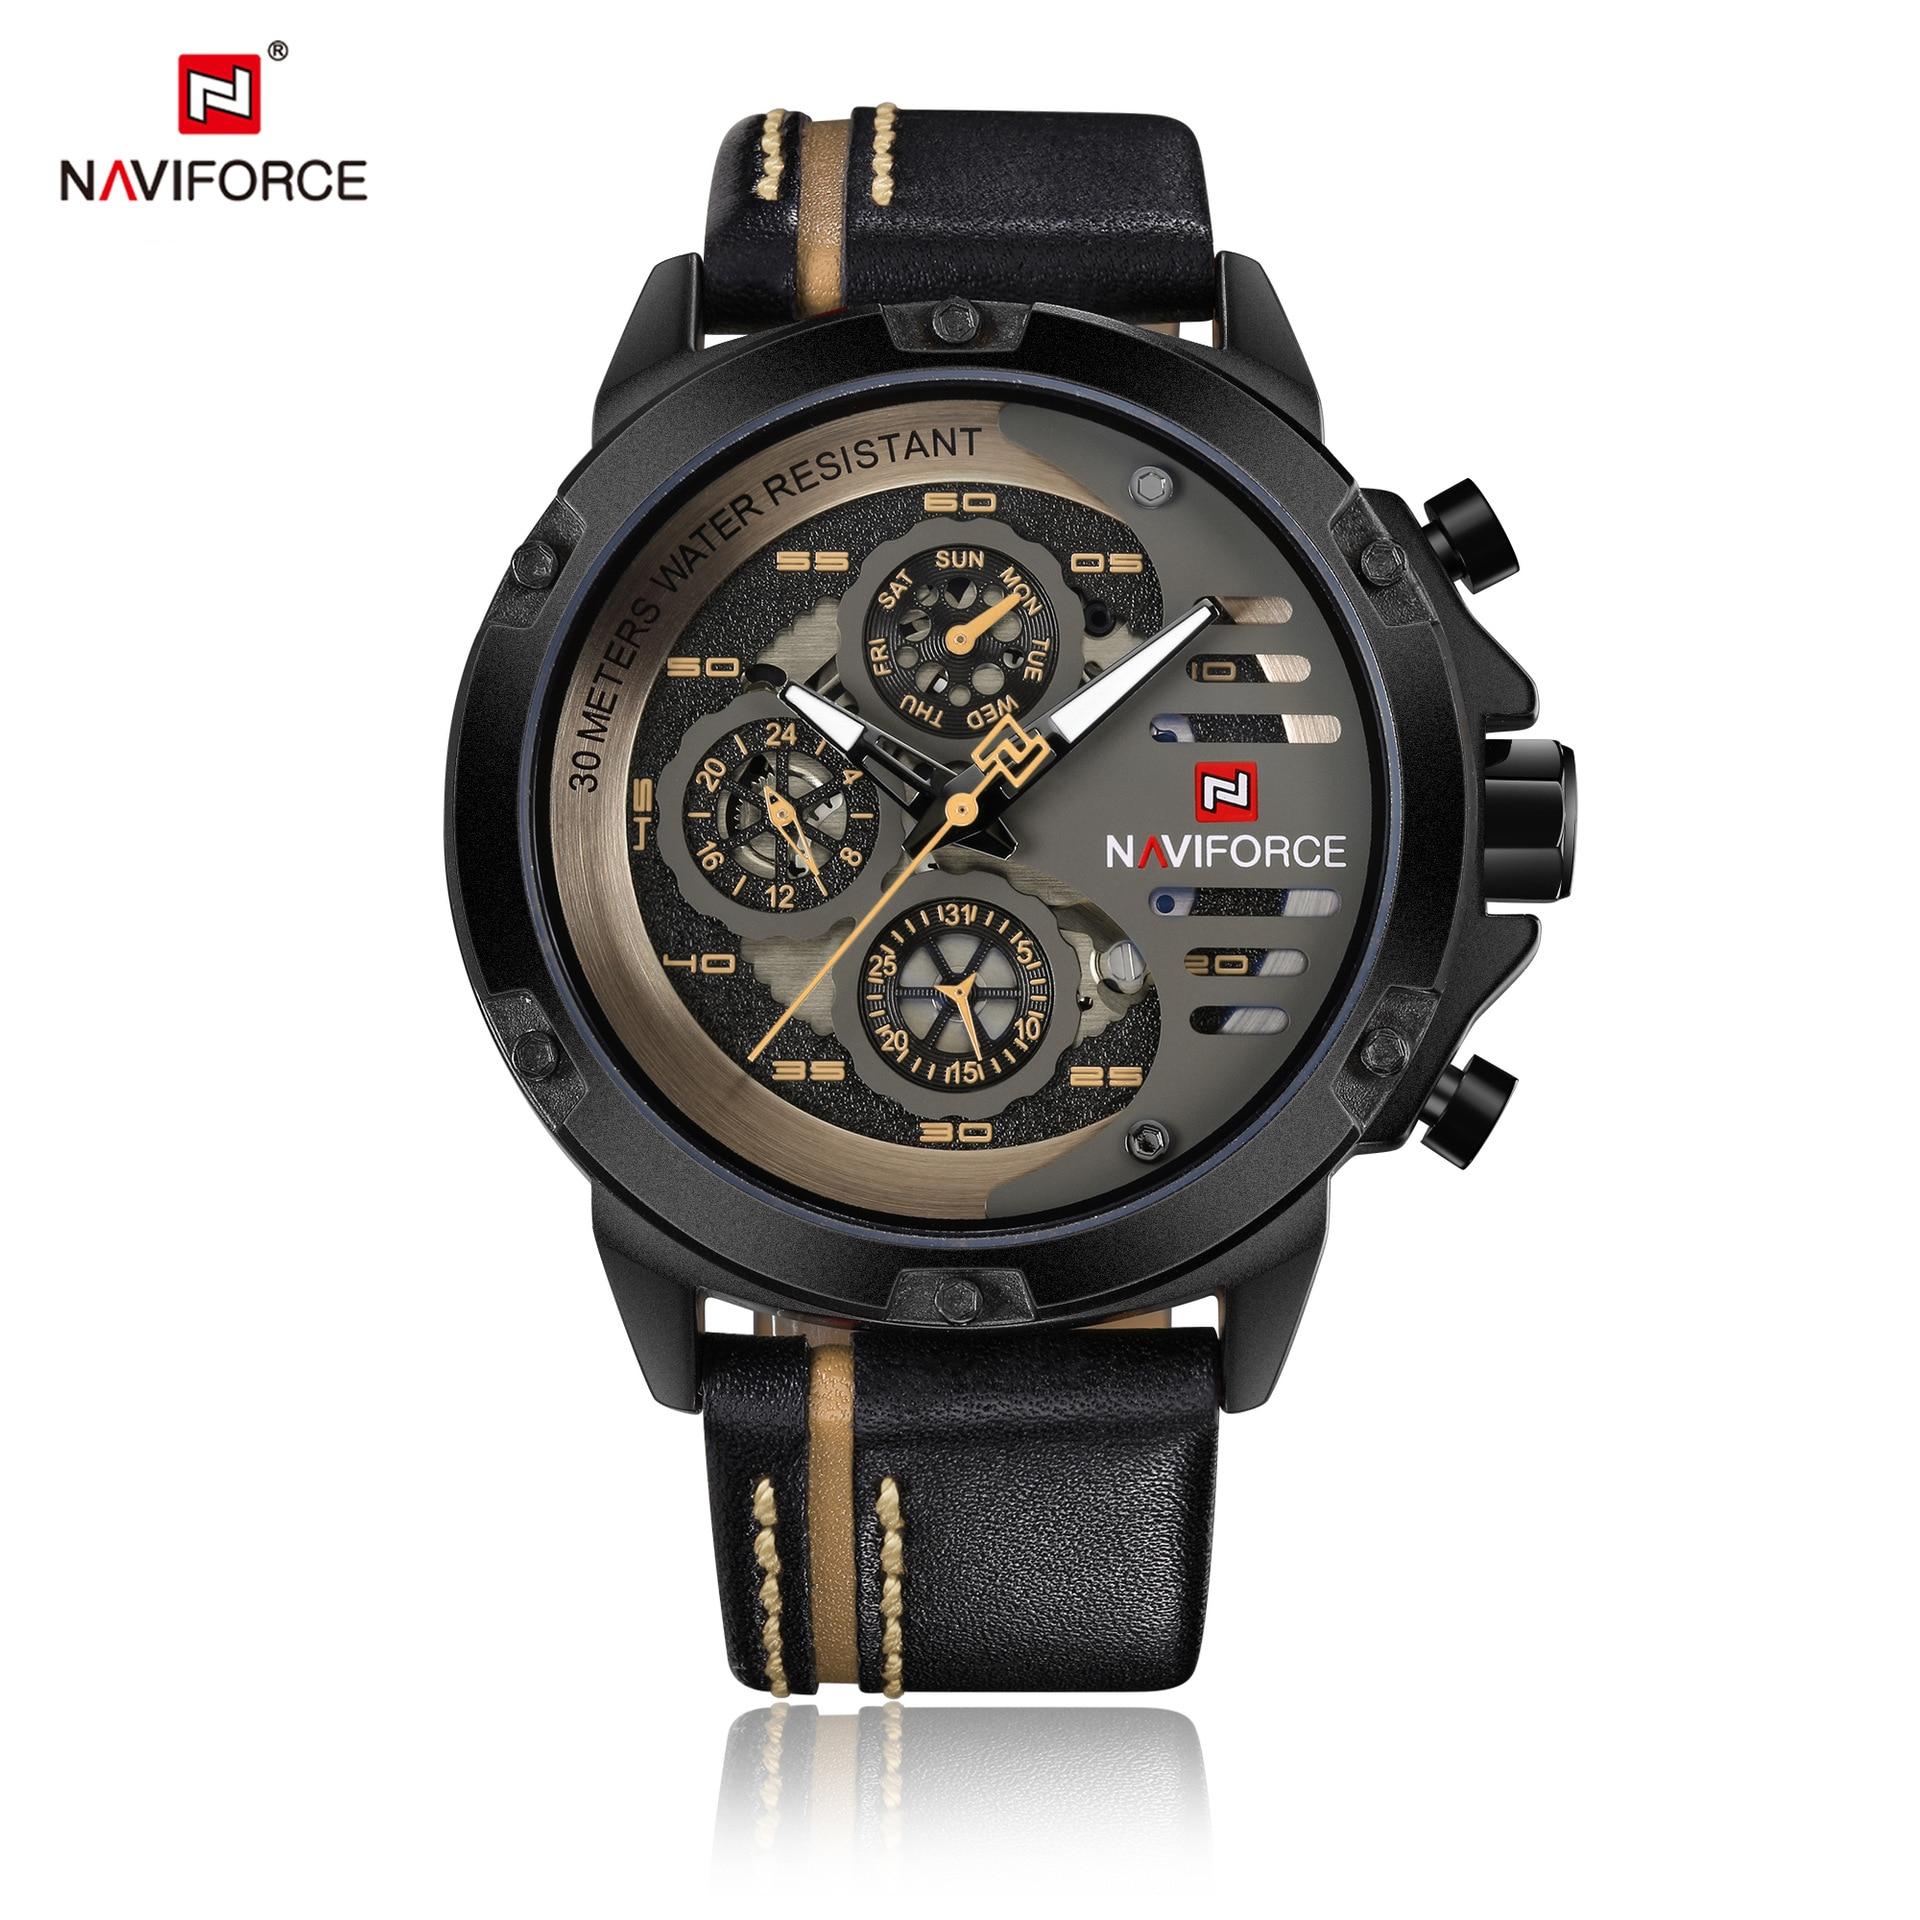 NAVIFORCE Mens Watches Top Brand Luxury Waterproof 24 hour Date Quartz Watch Man Leather Sport Wrist Watch Men Waterproof Clock цена